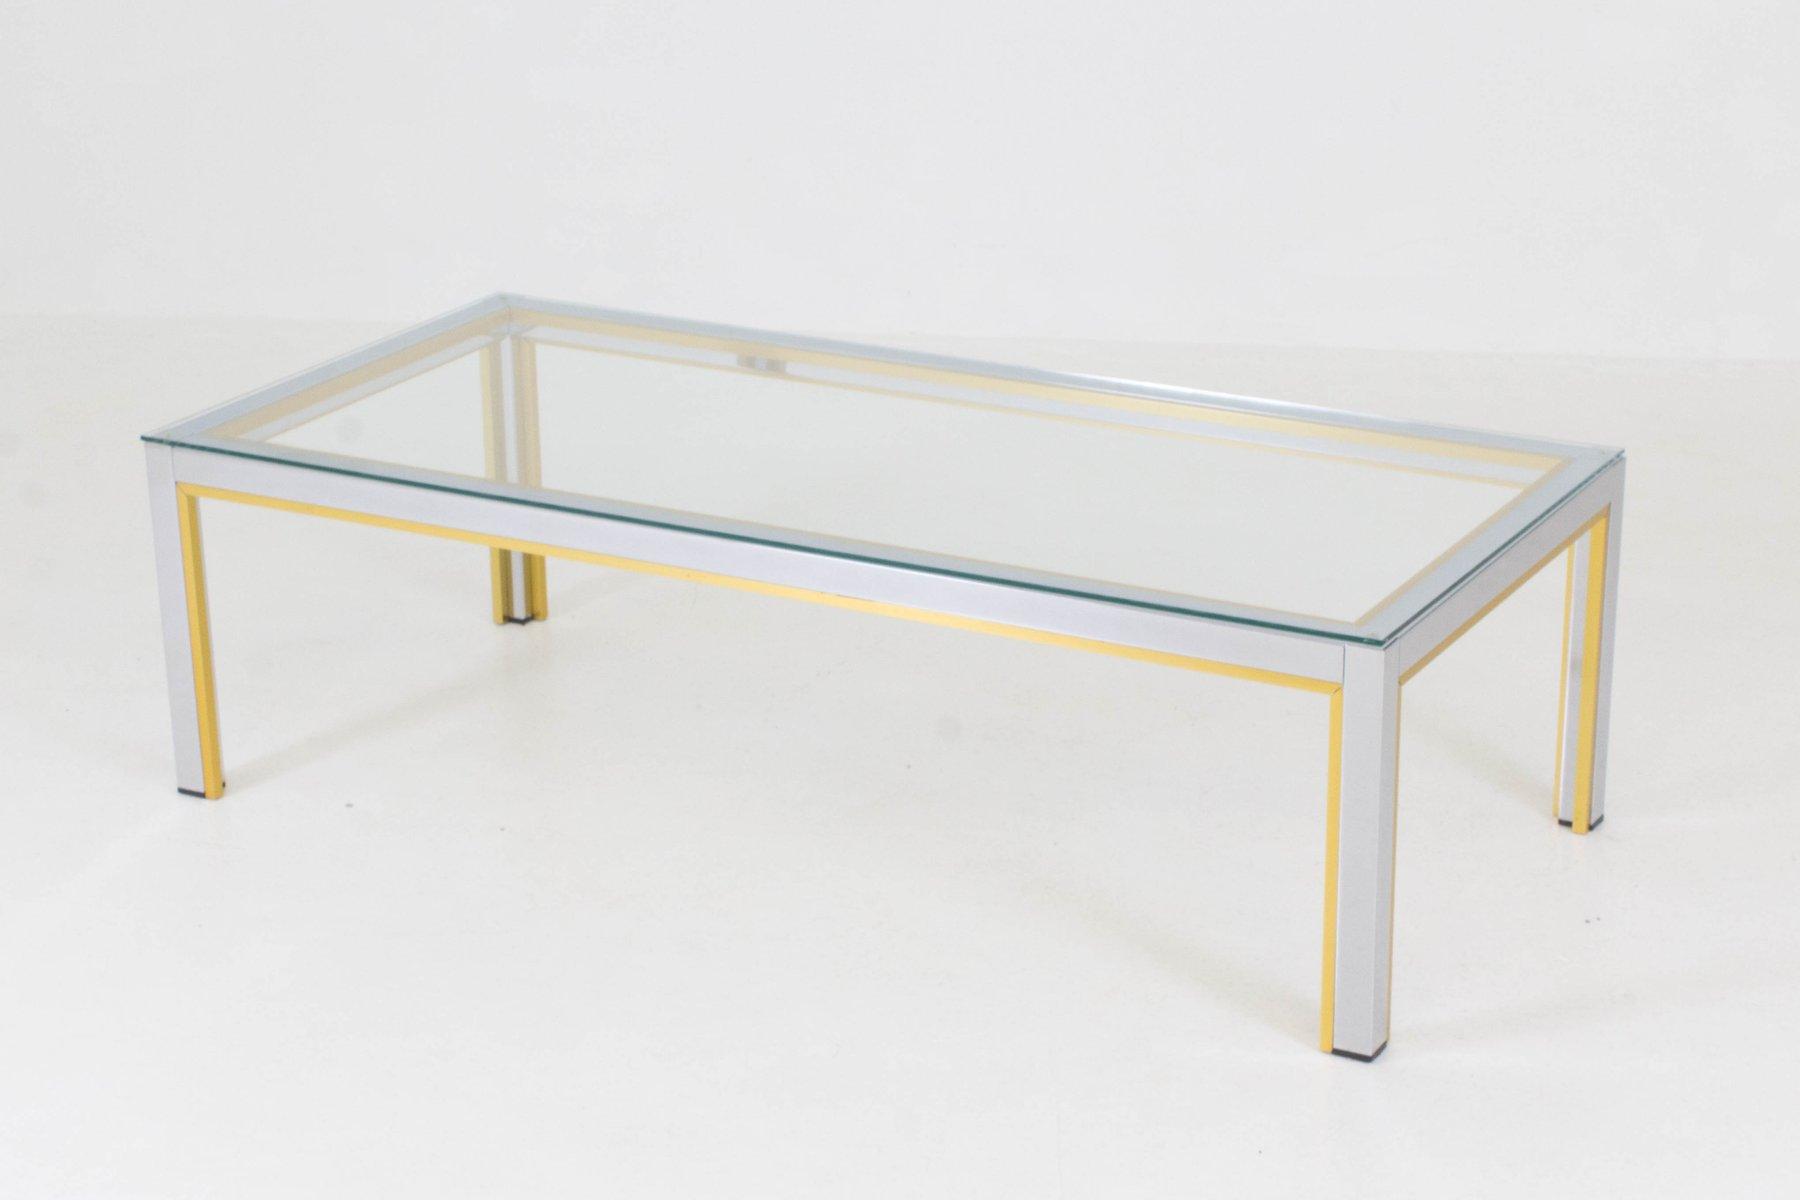 Italian coffee table by romeo rega 1970s for sale at pamono for Italian coffee table